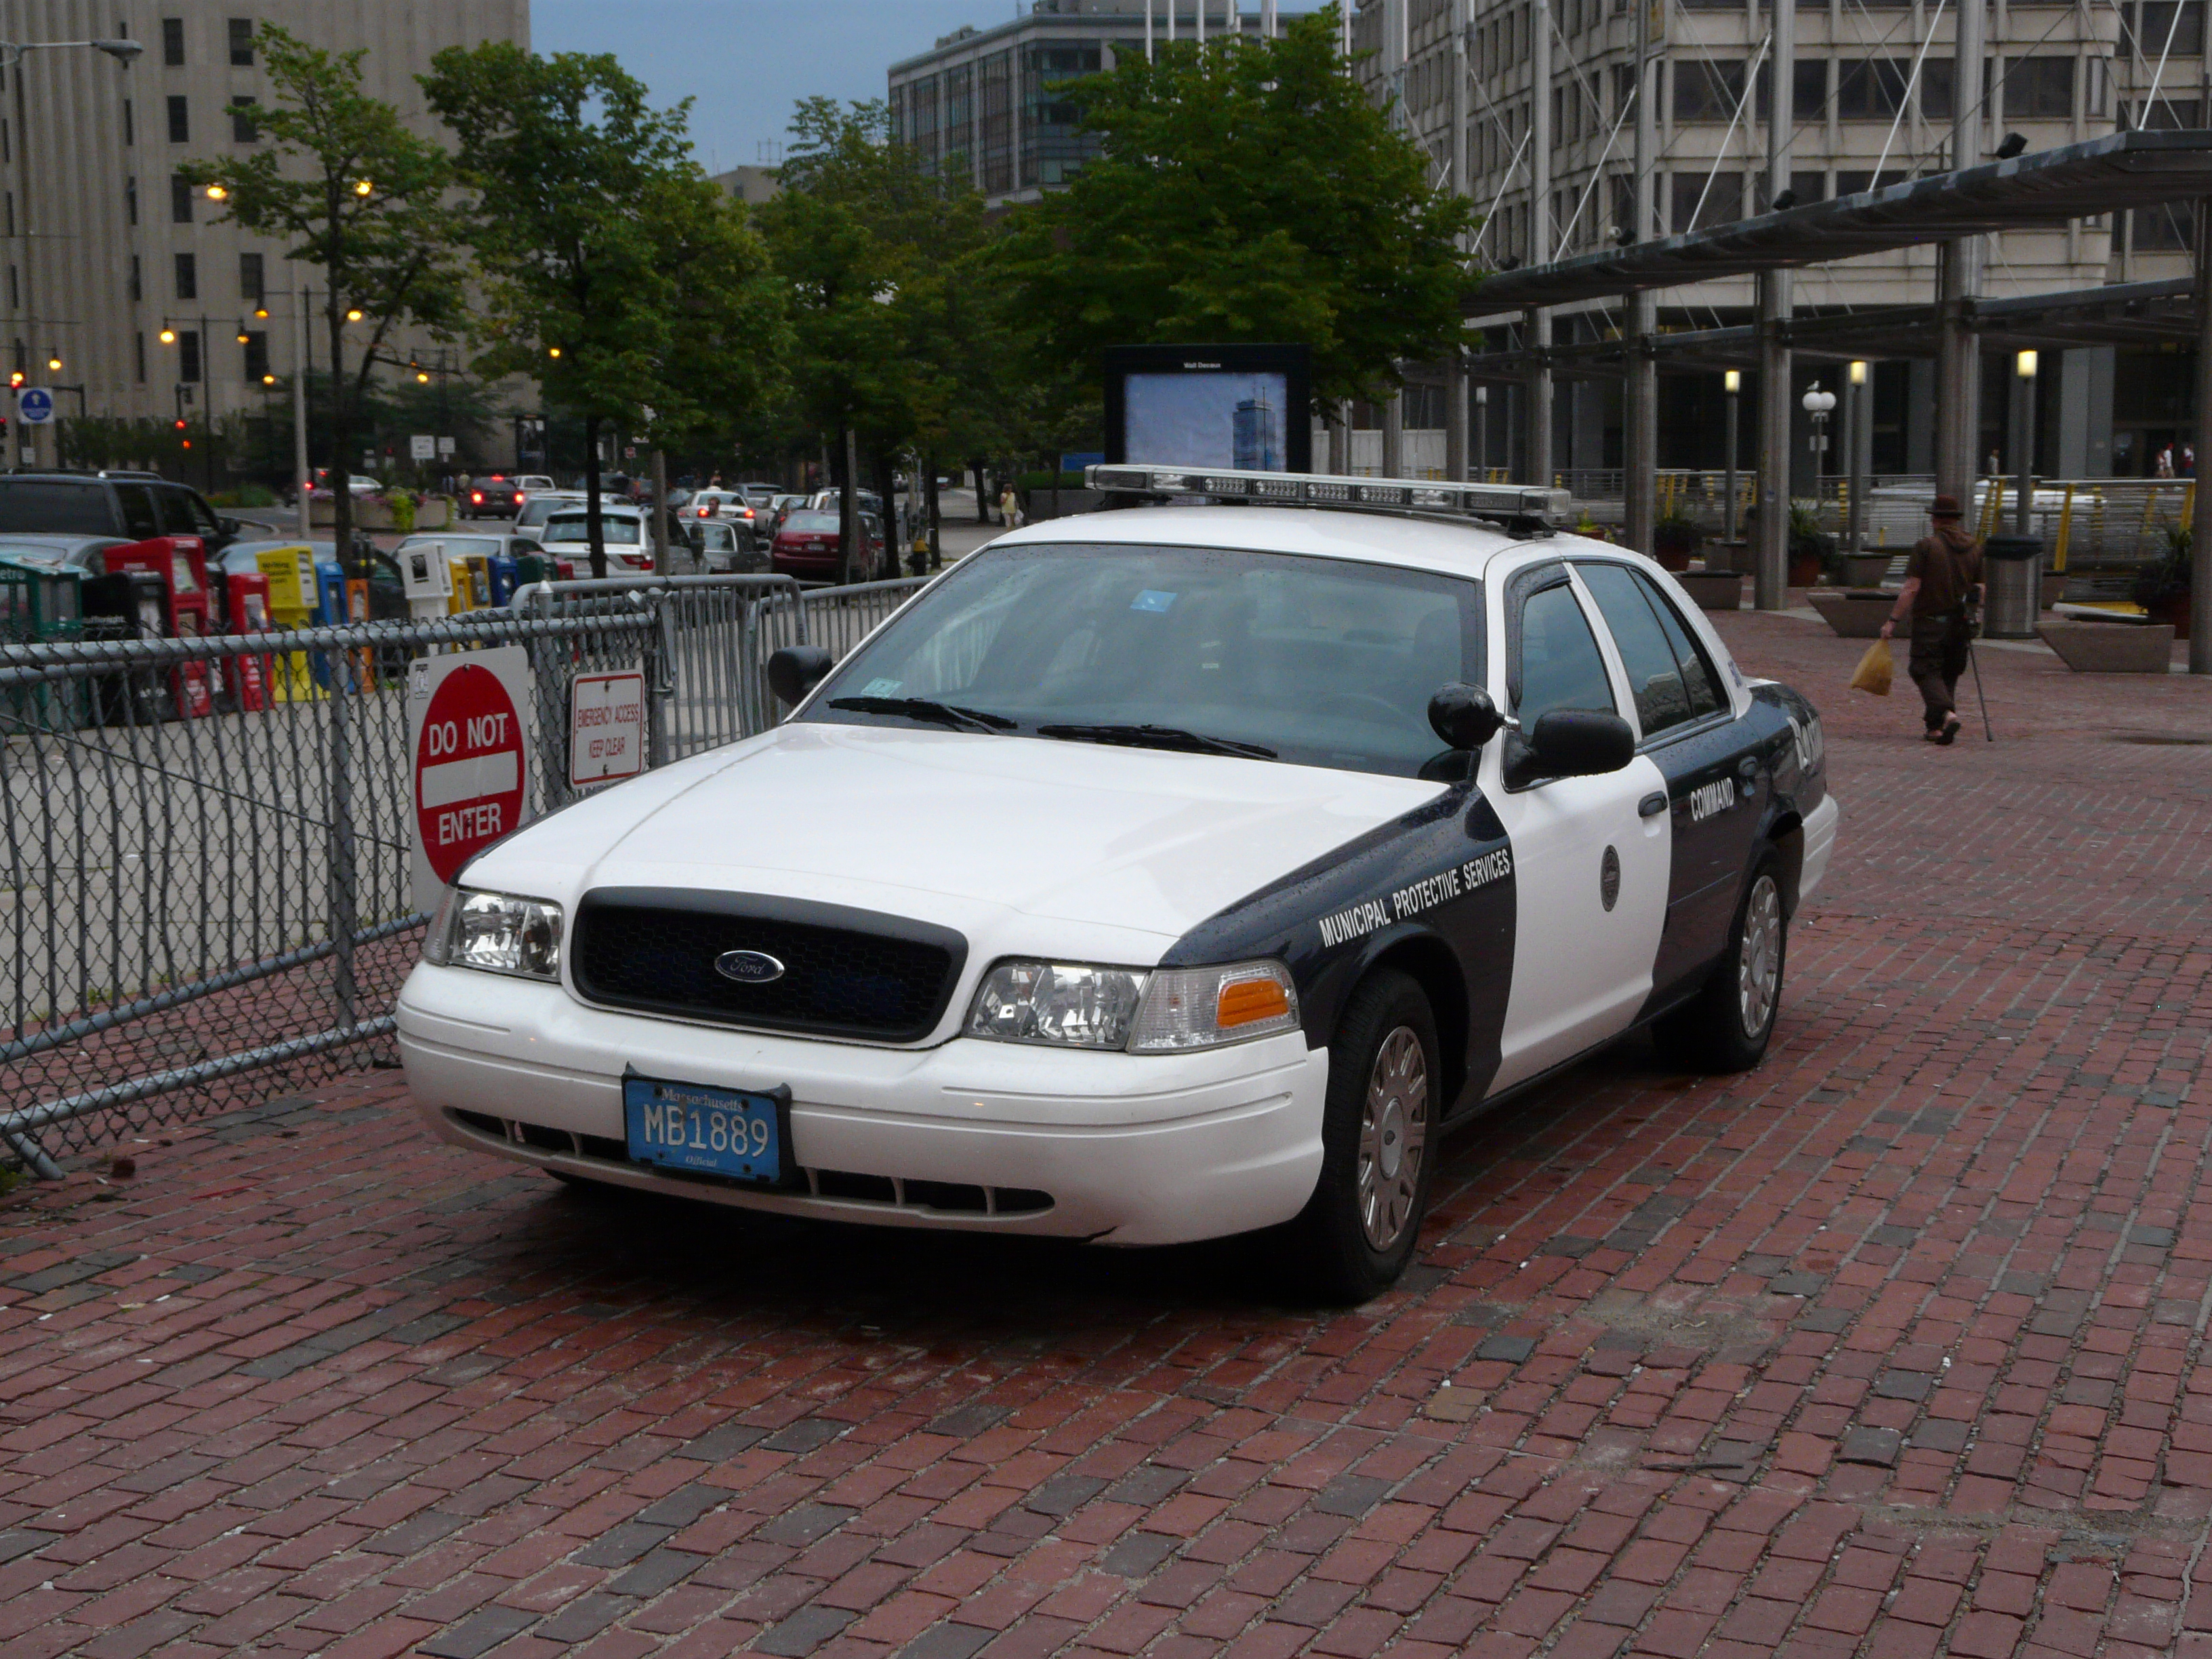 Boston Police Car Accident